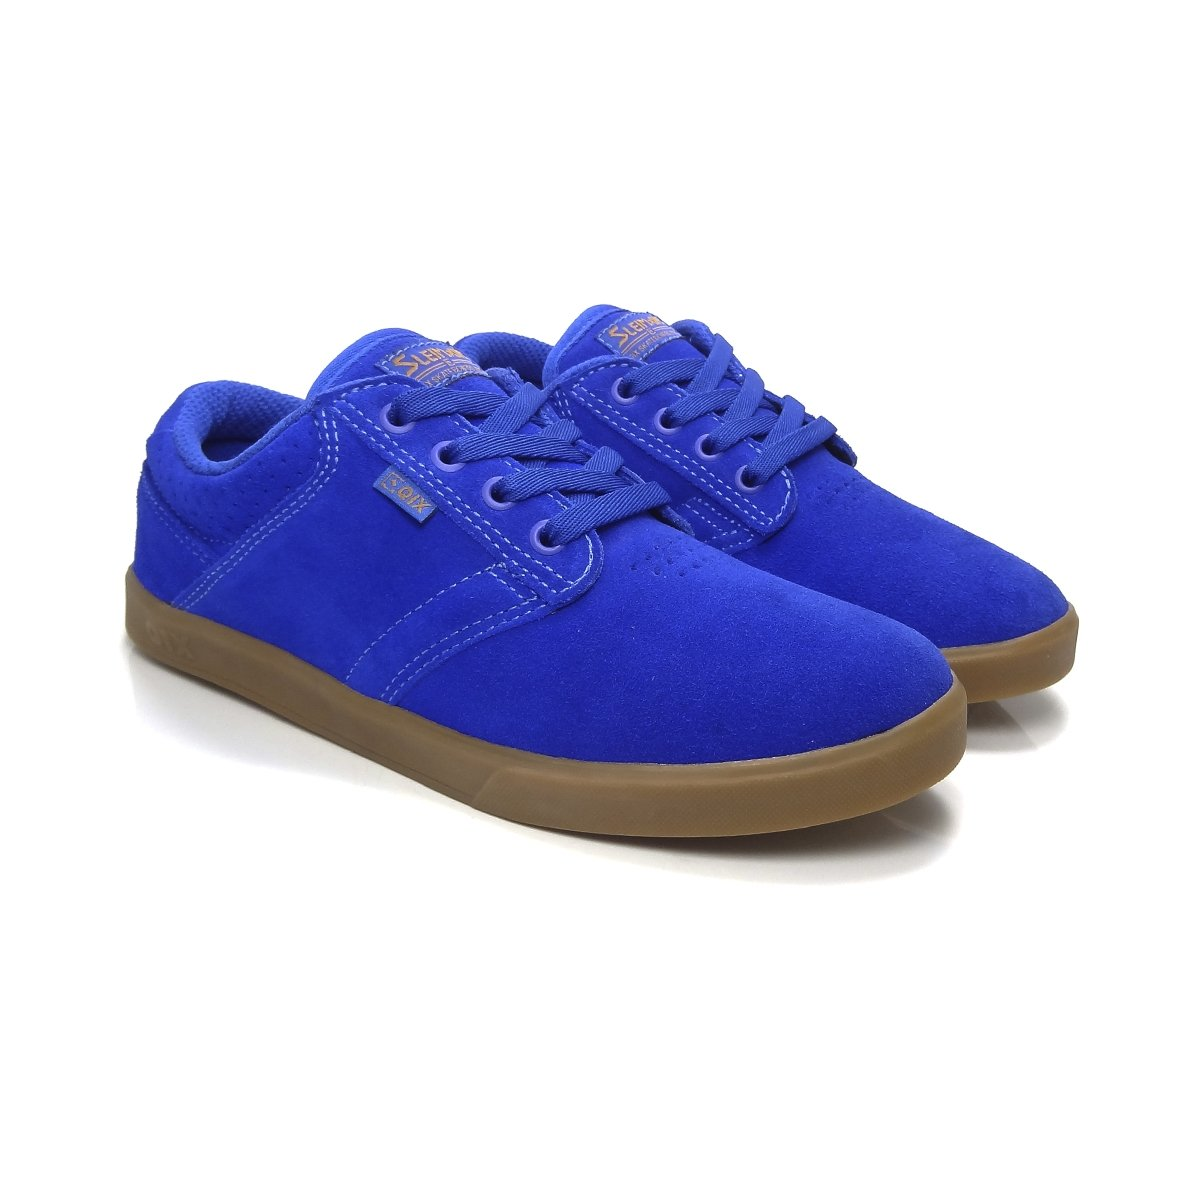 4de8f94eb9 Escuro Royal Tênis Qix Skate Sleiman Azul Tênis Skate Azul YOpZ88 ...